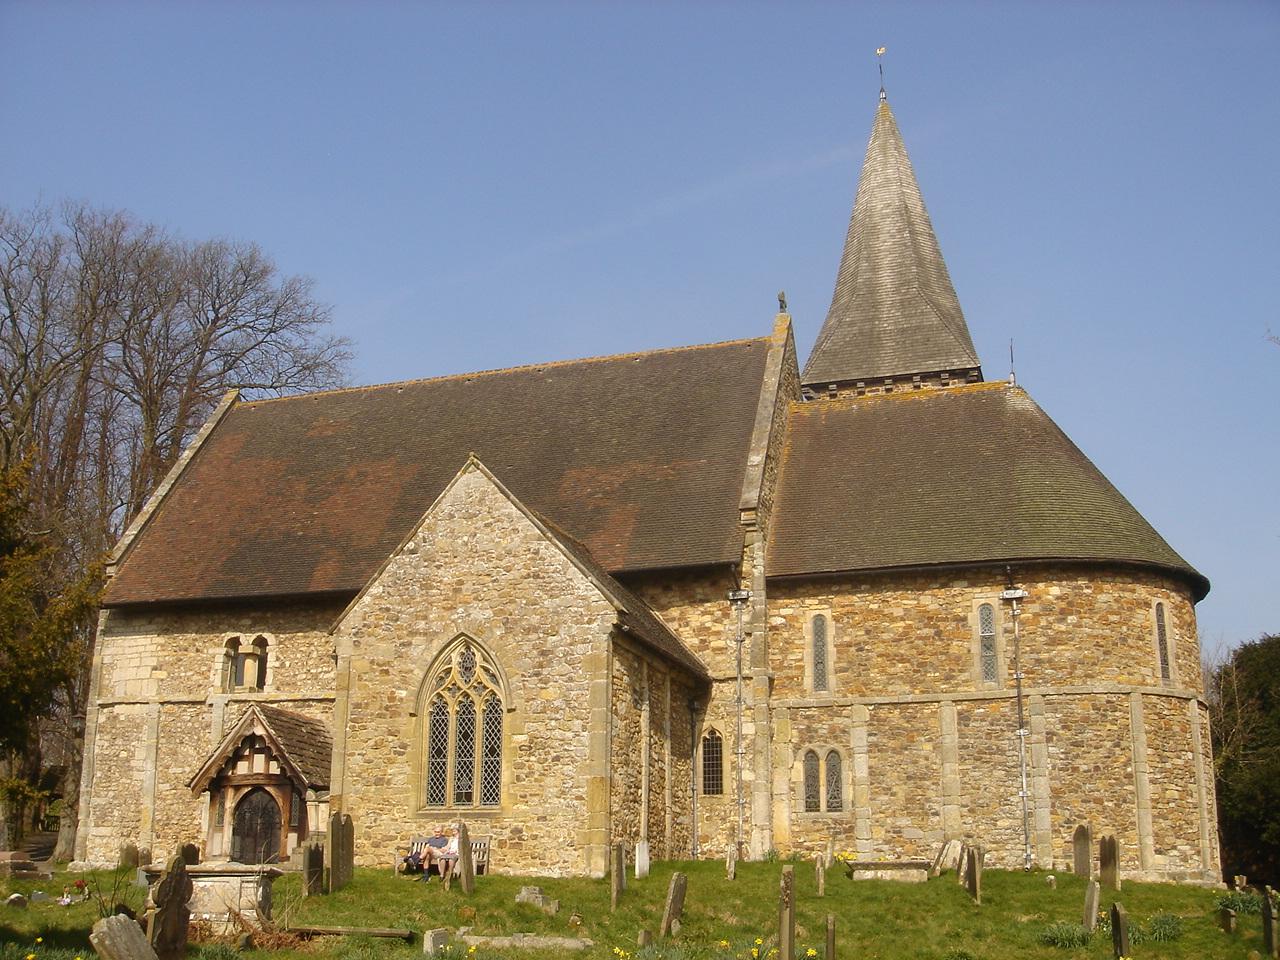 Bild - Worth, St. Nicholas Church, by Voice of Hassocks 2009-03-21 ...